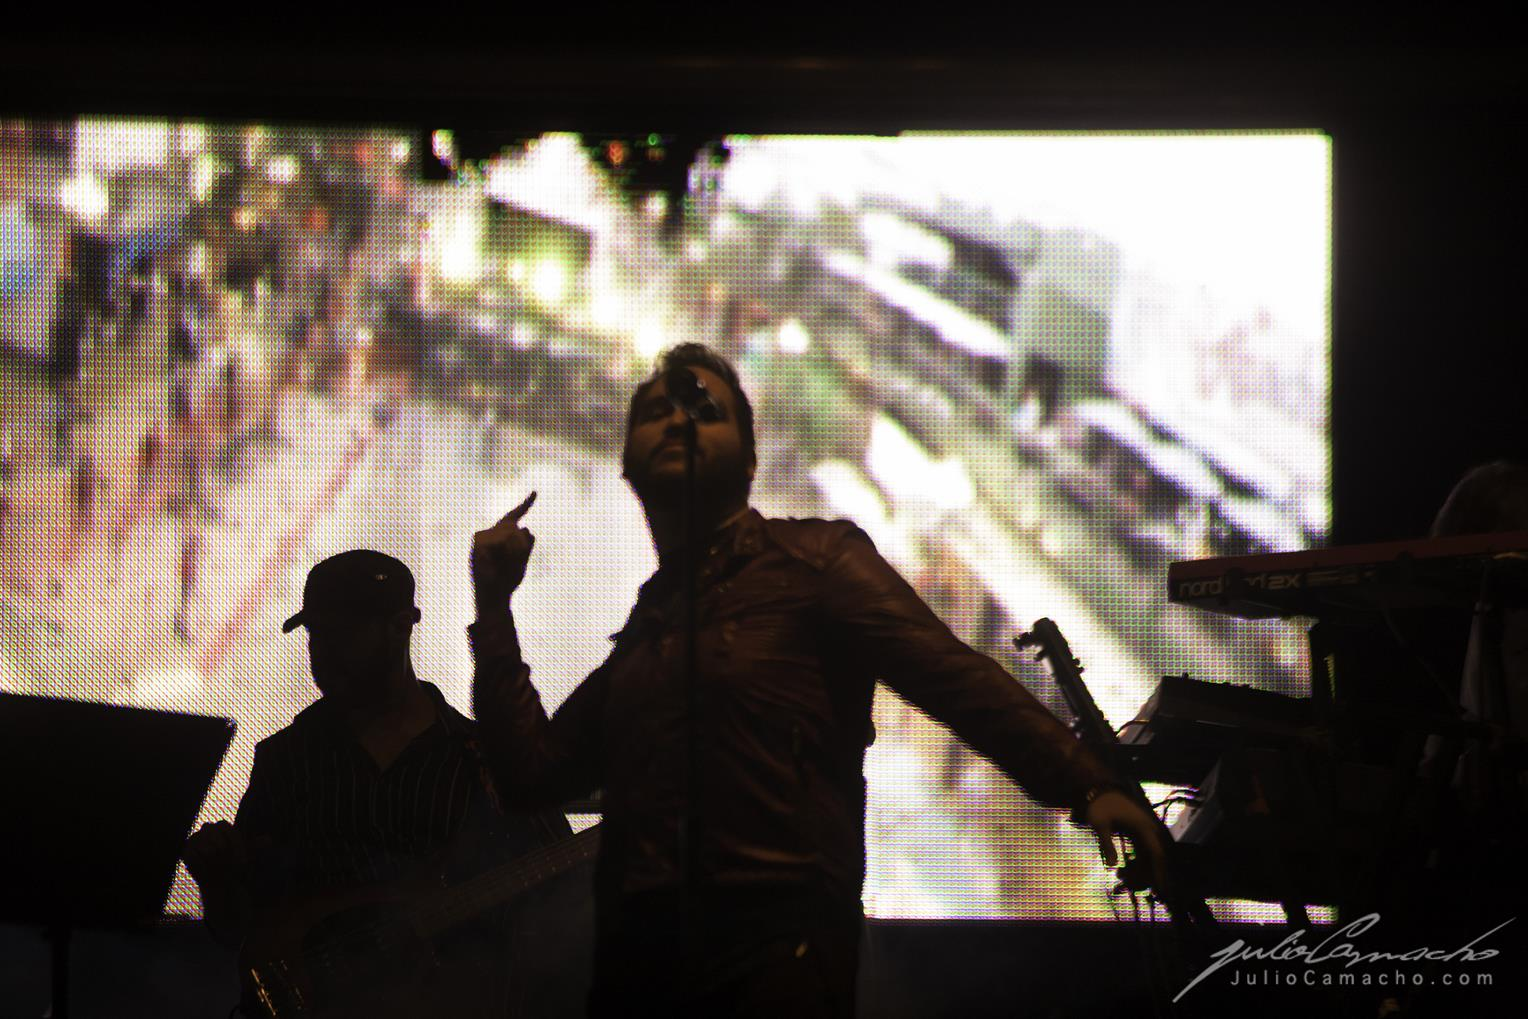 2014-10-30 31 CAST TOUR Ensenada y Tijuana - 1387 - www.Juli (Copy).jpg